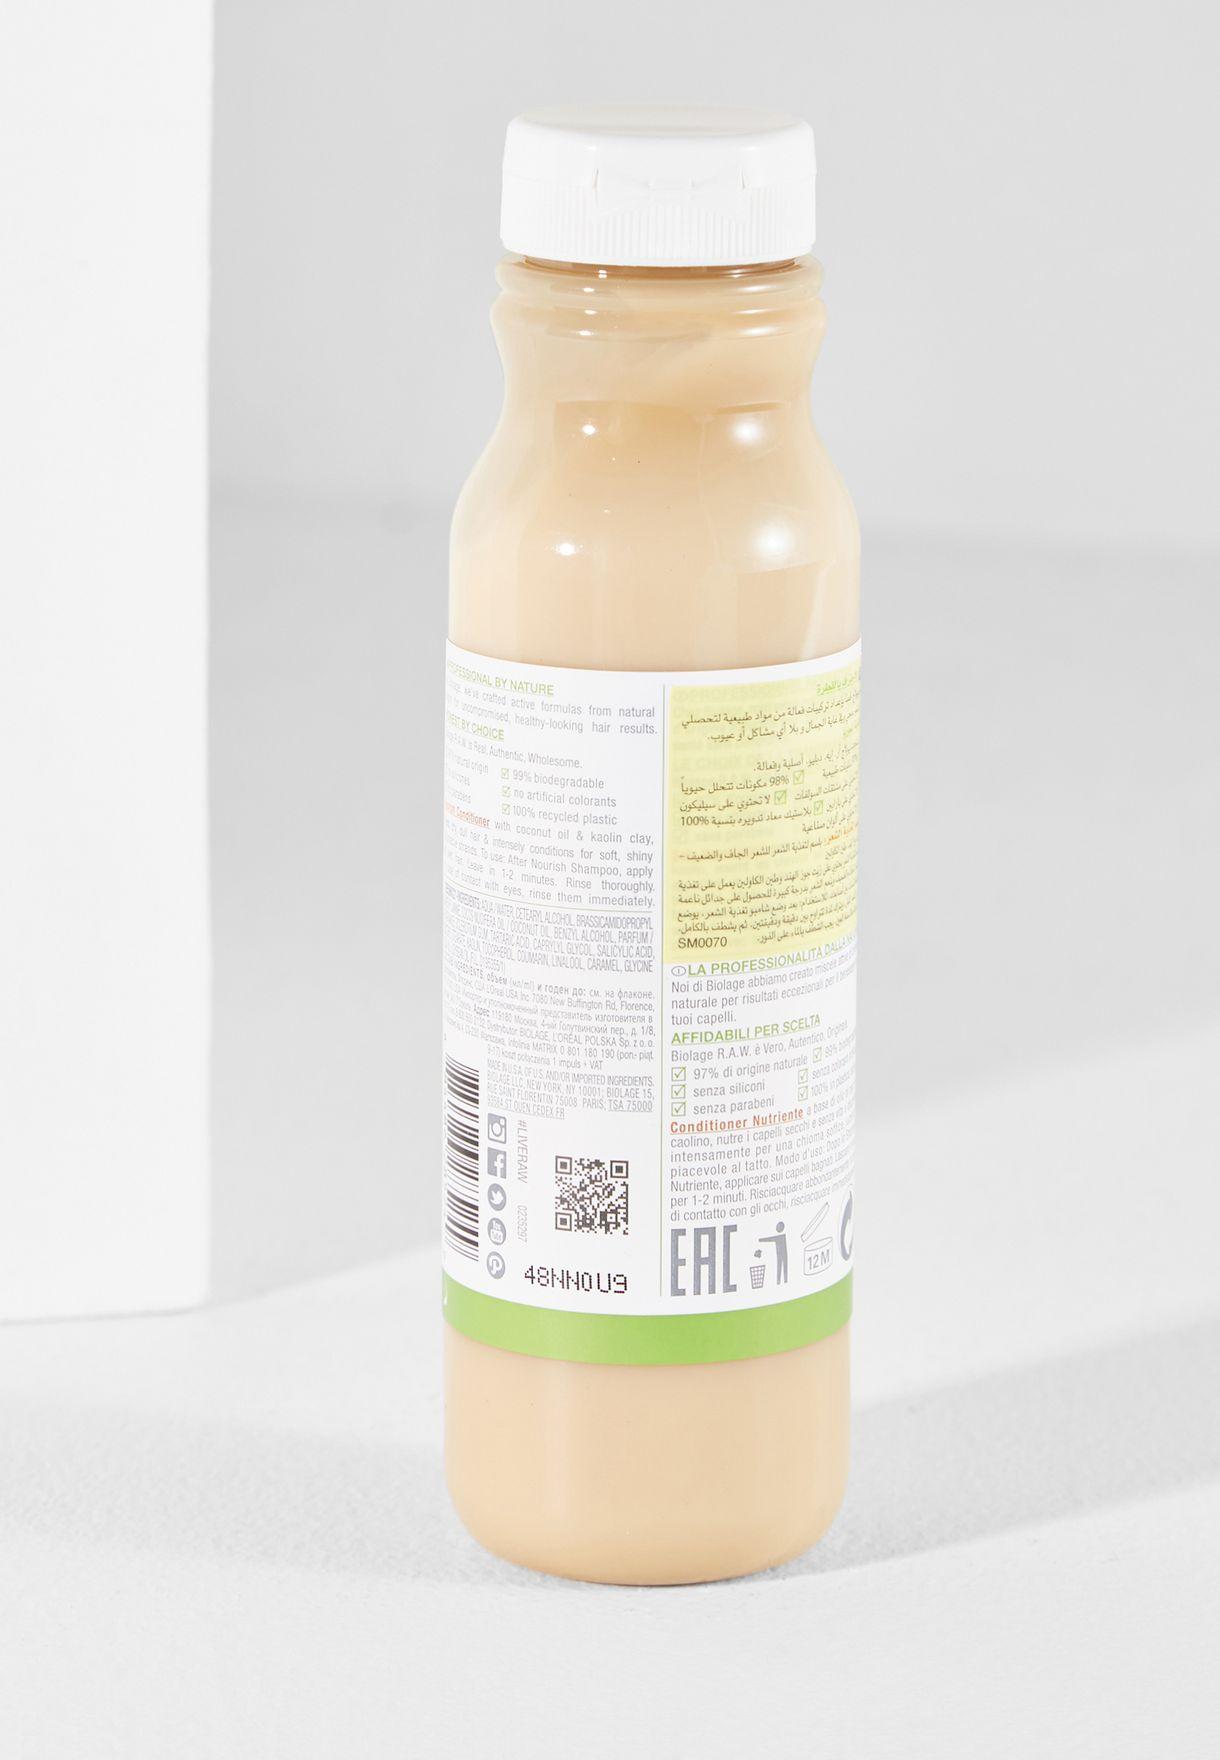 Biolage RAW Nourishing Conditioner